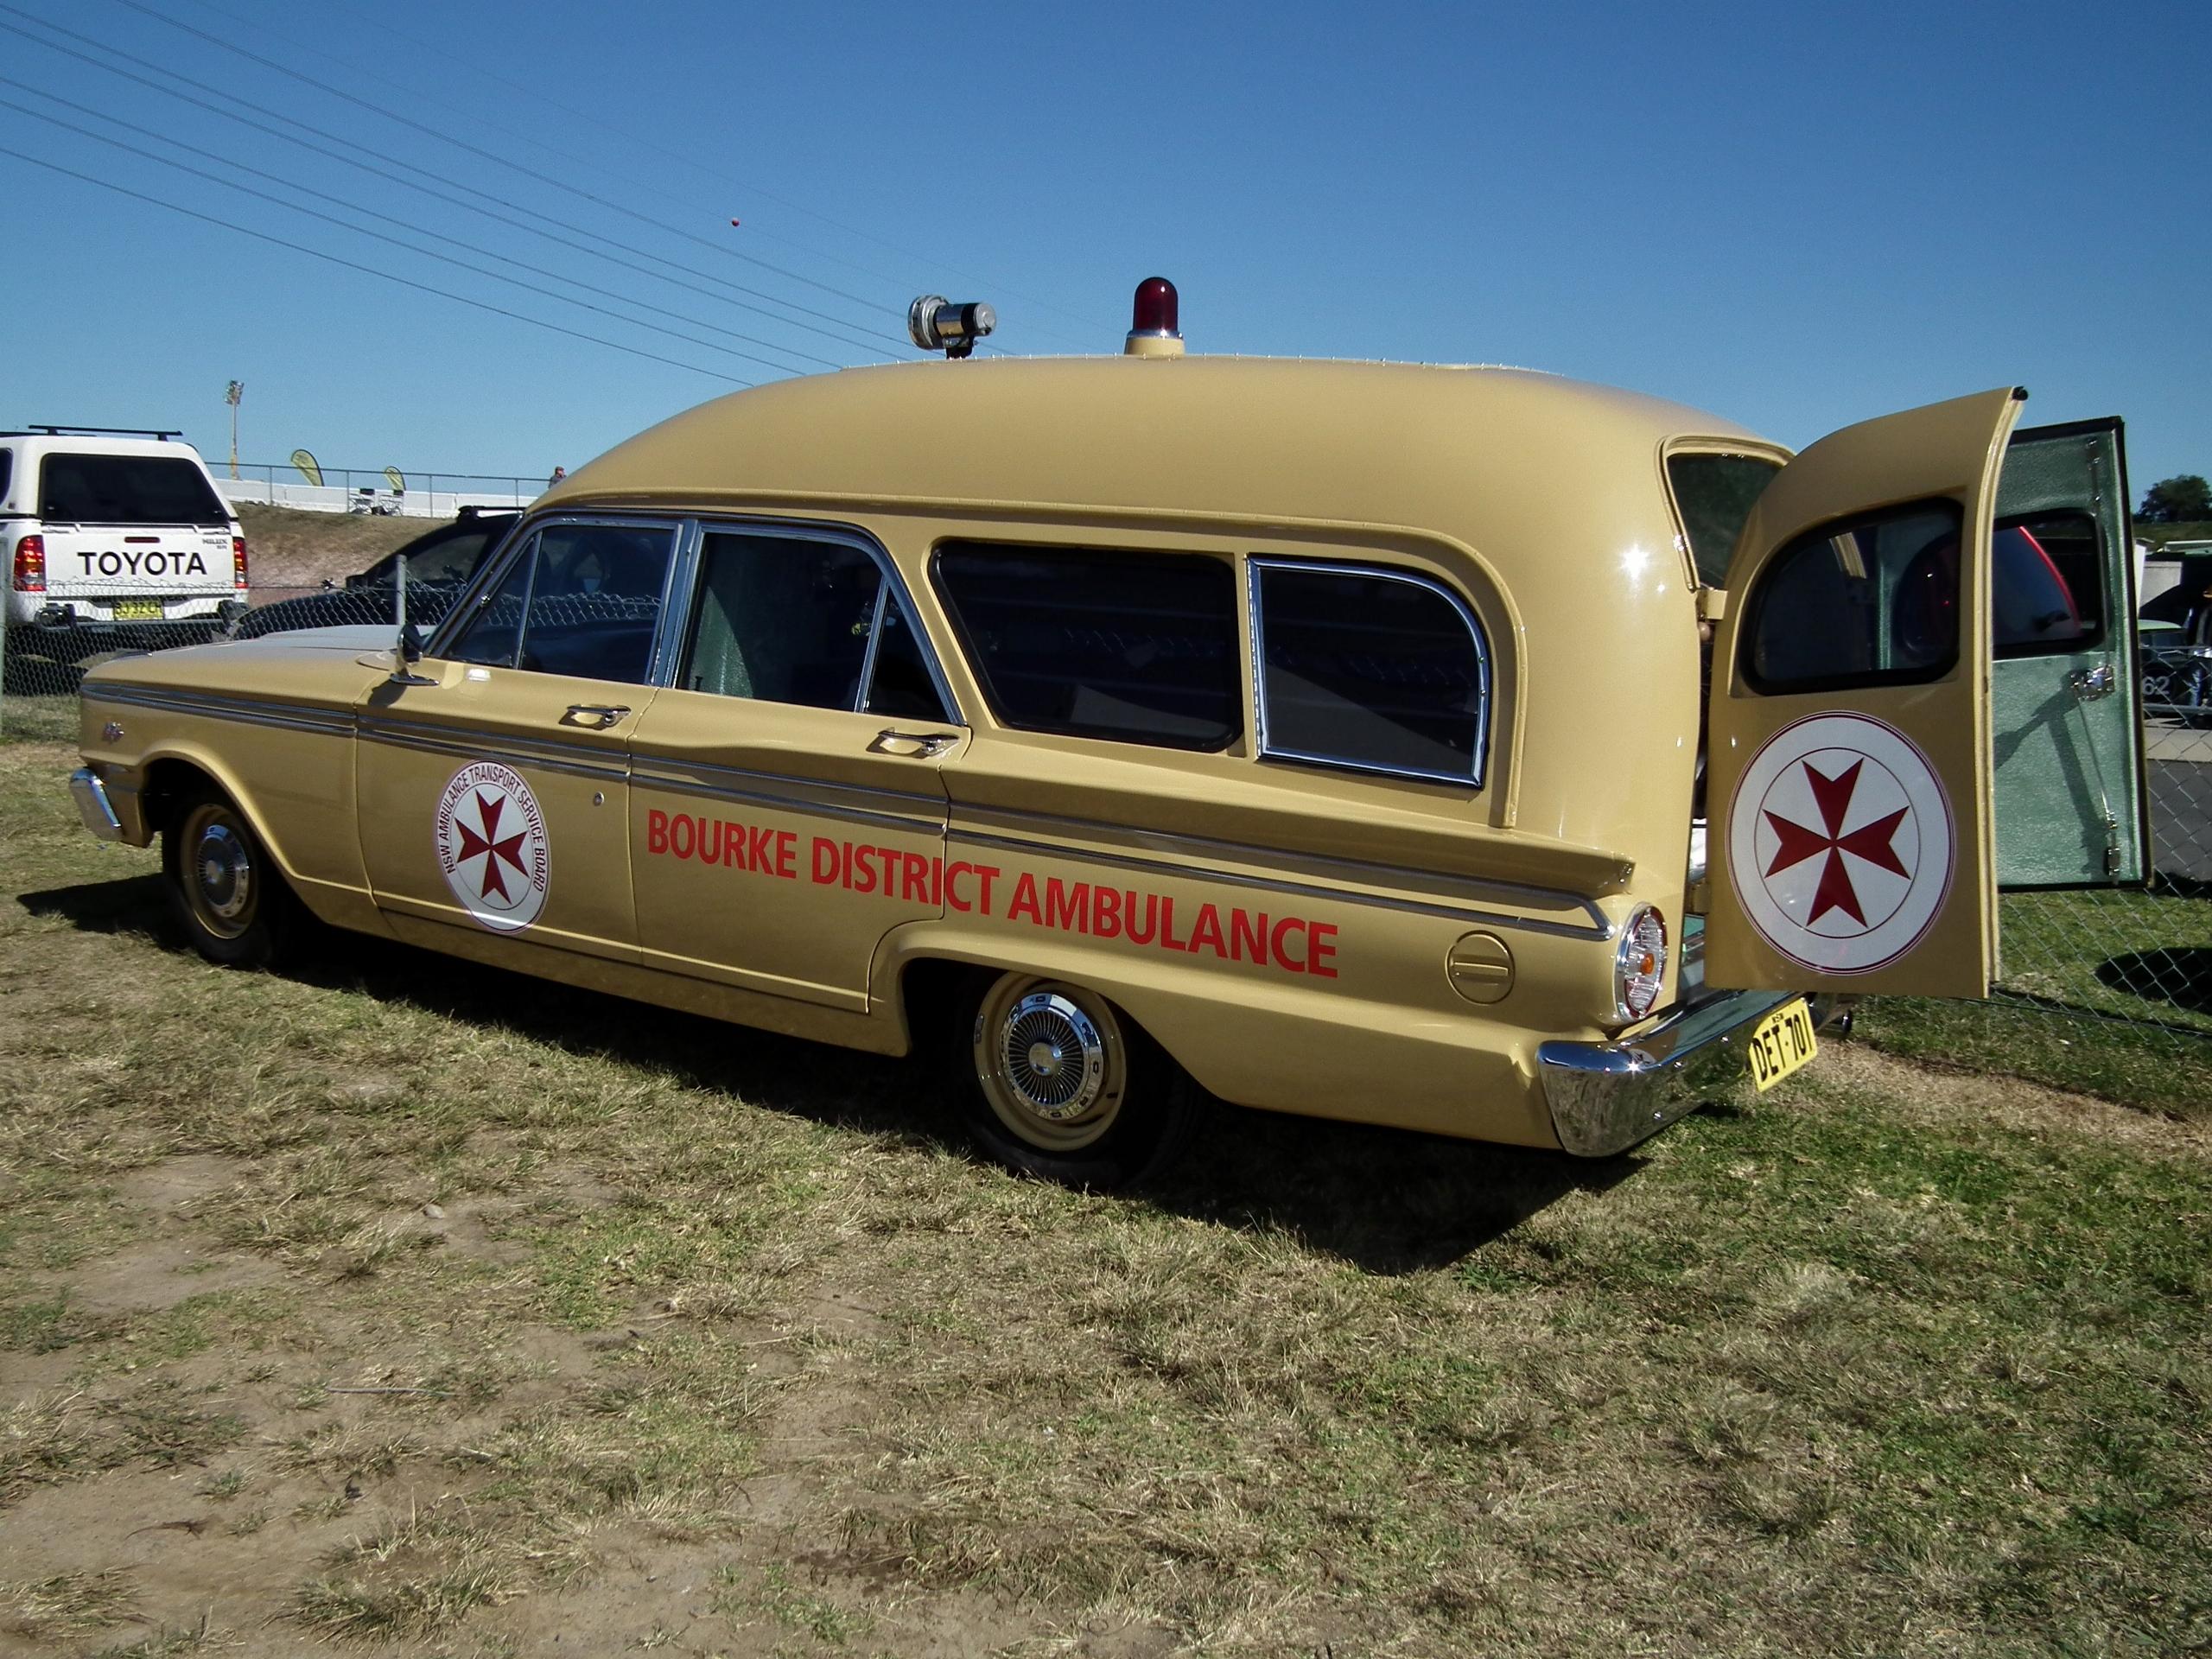 File:1963 Ford Fairlane 500 ambulance - Bourke District